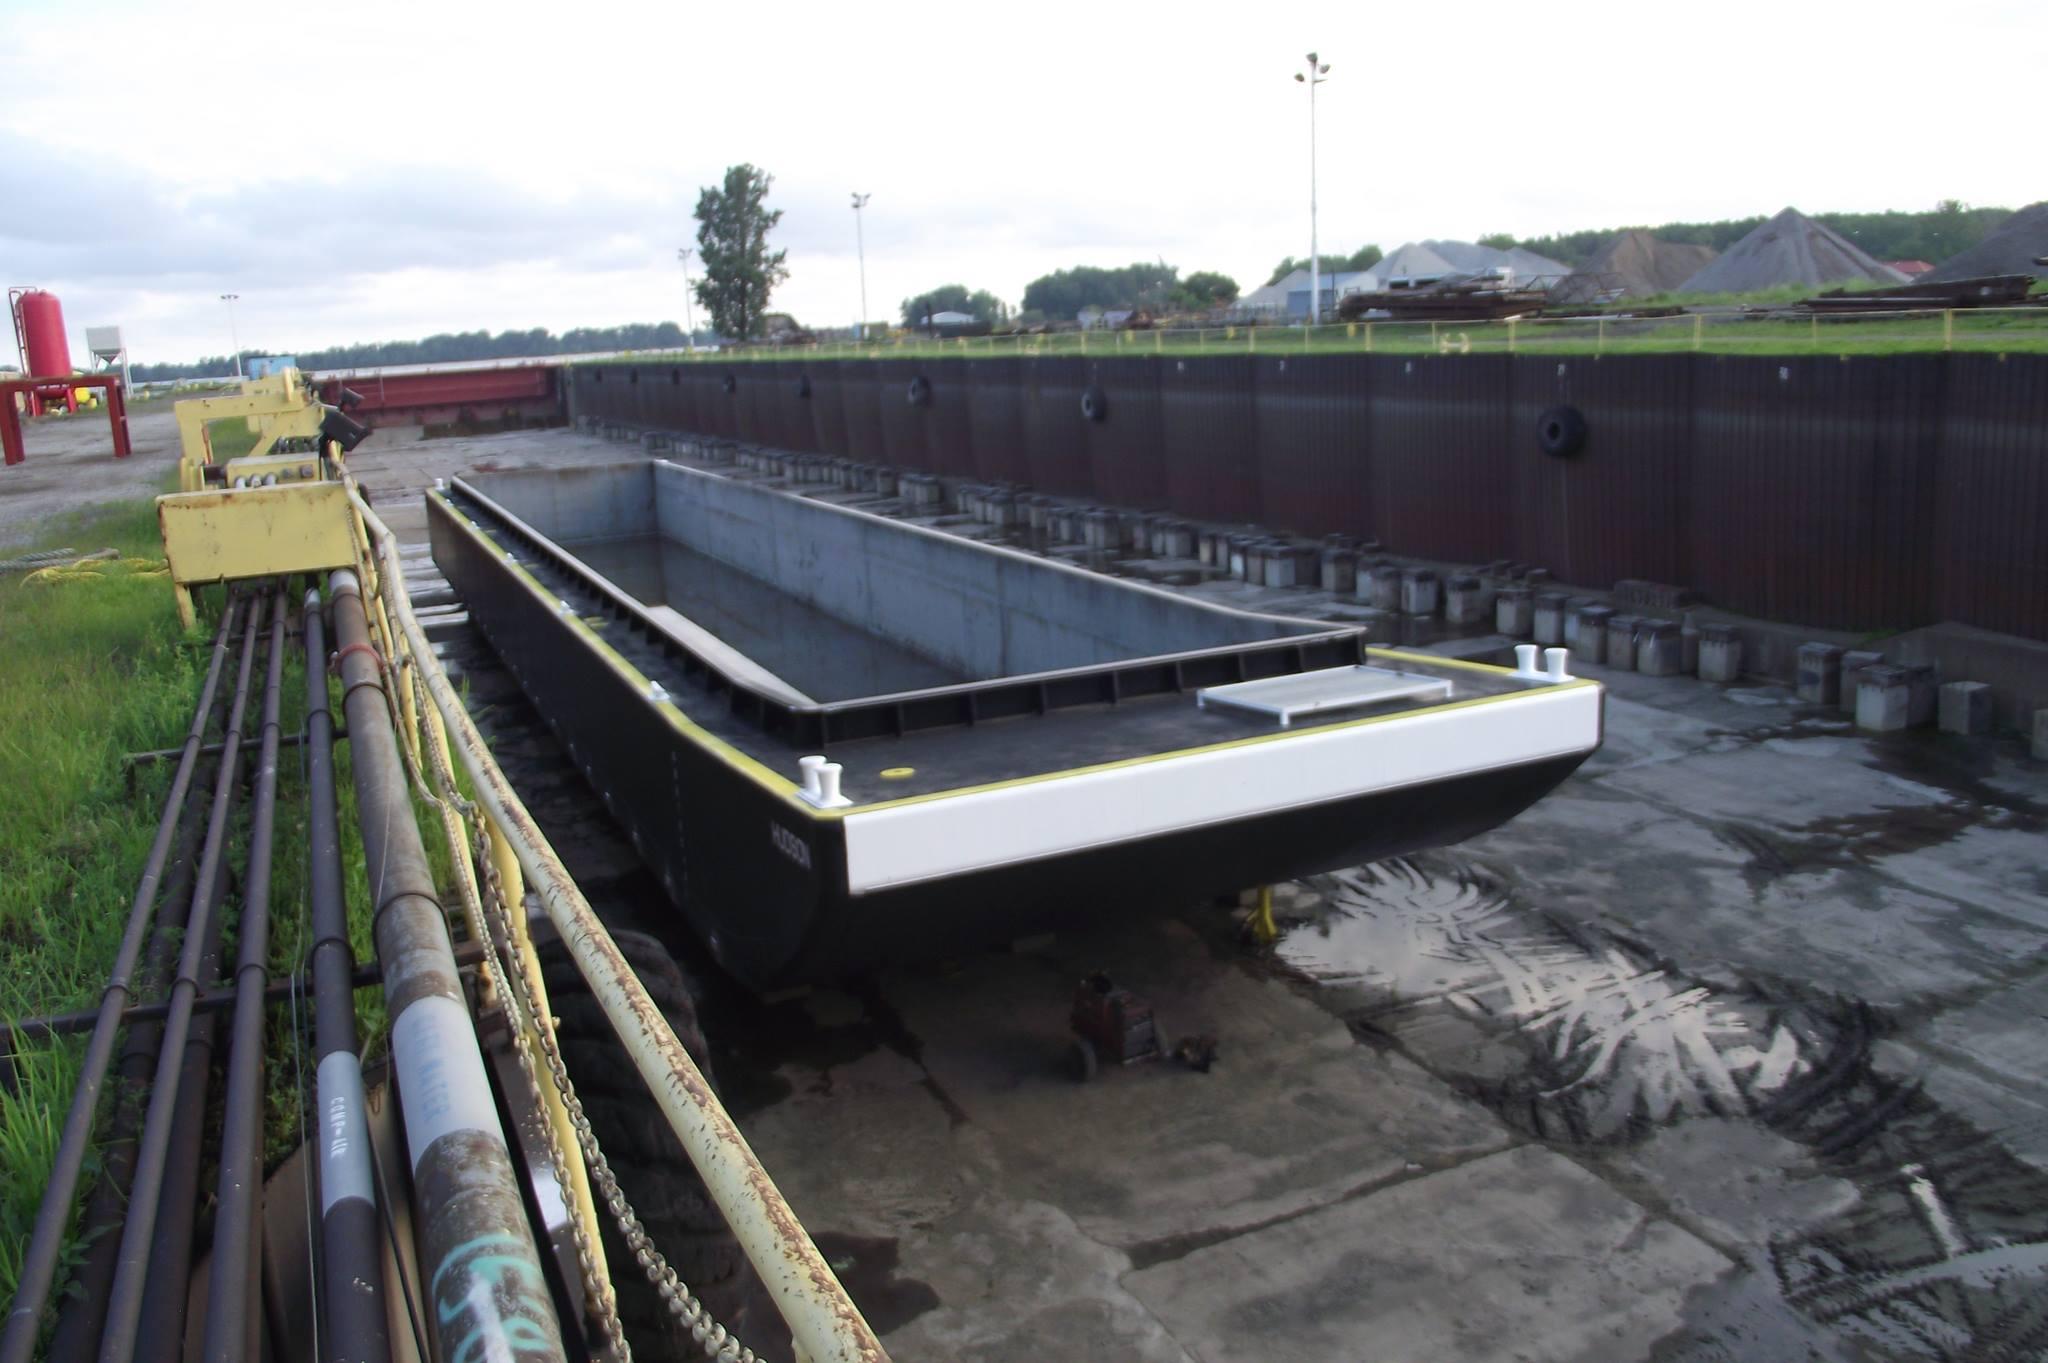 Donjon Shipbuilding and Repair LLC 220 E Bayfront Pkwy, Erie